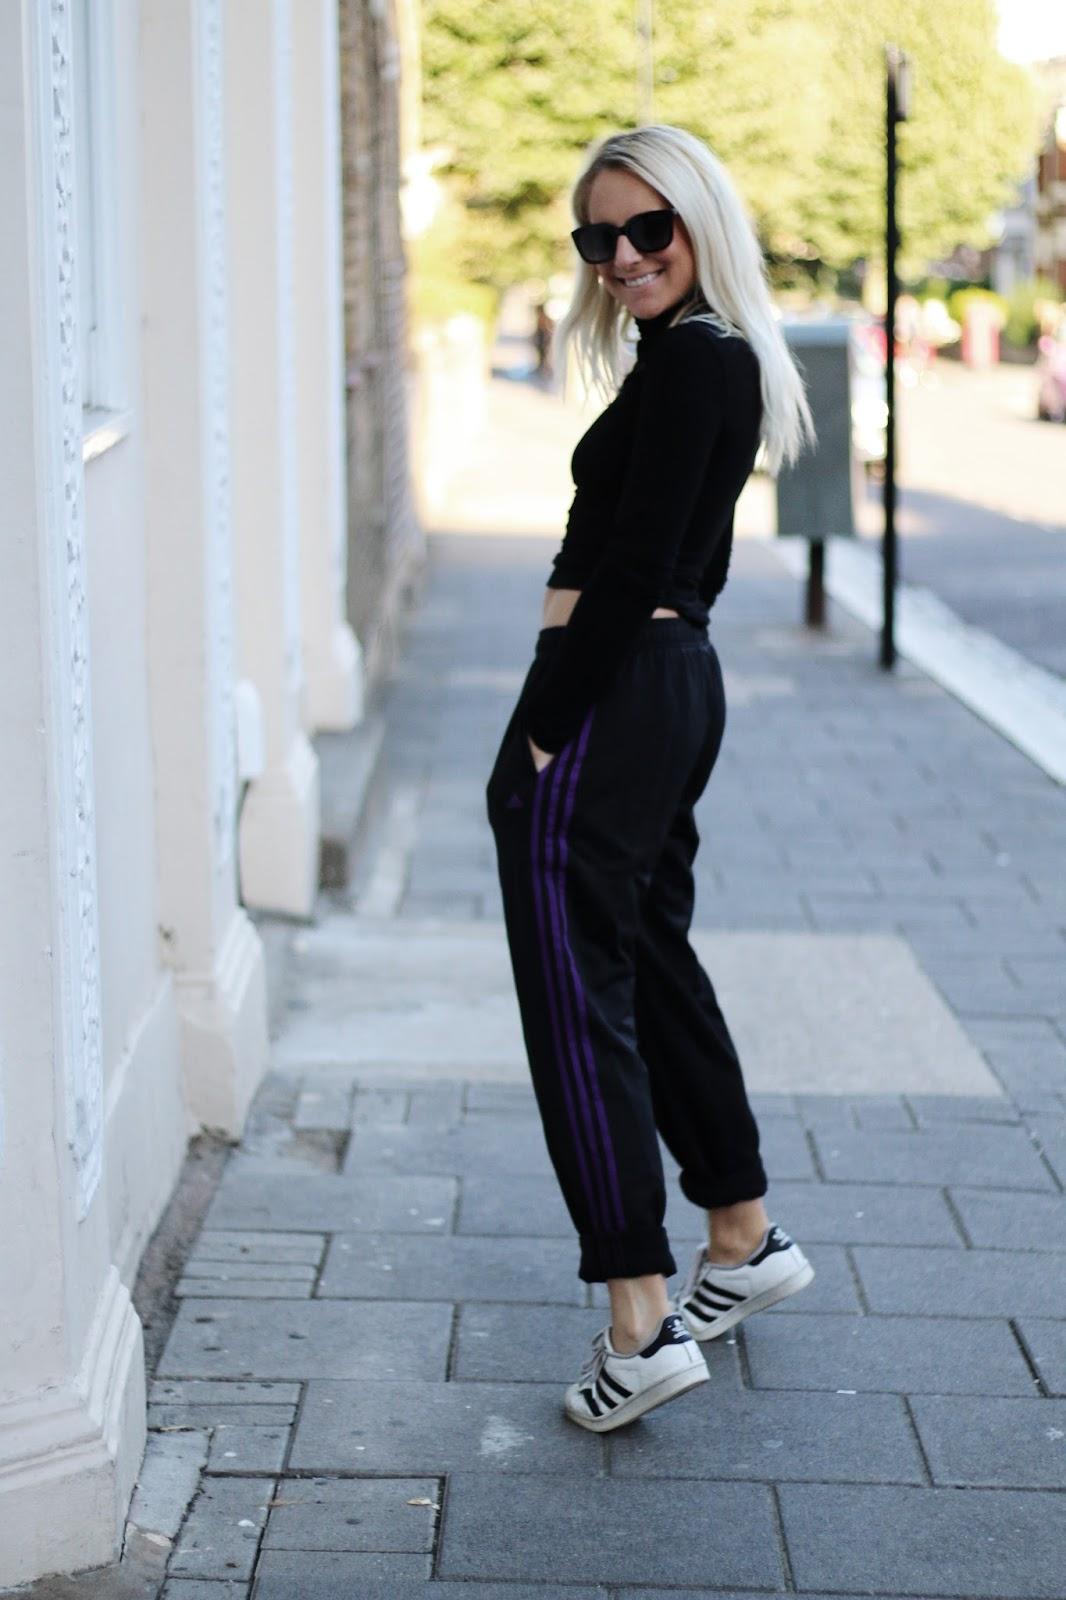 Adidas tracksuit street style